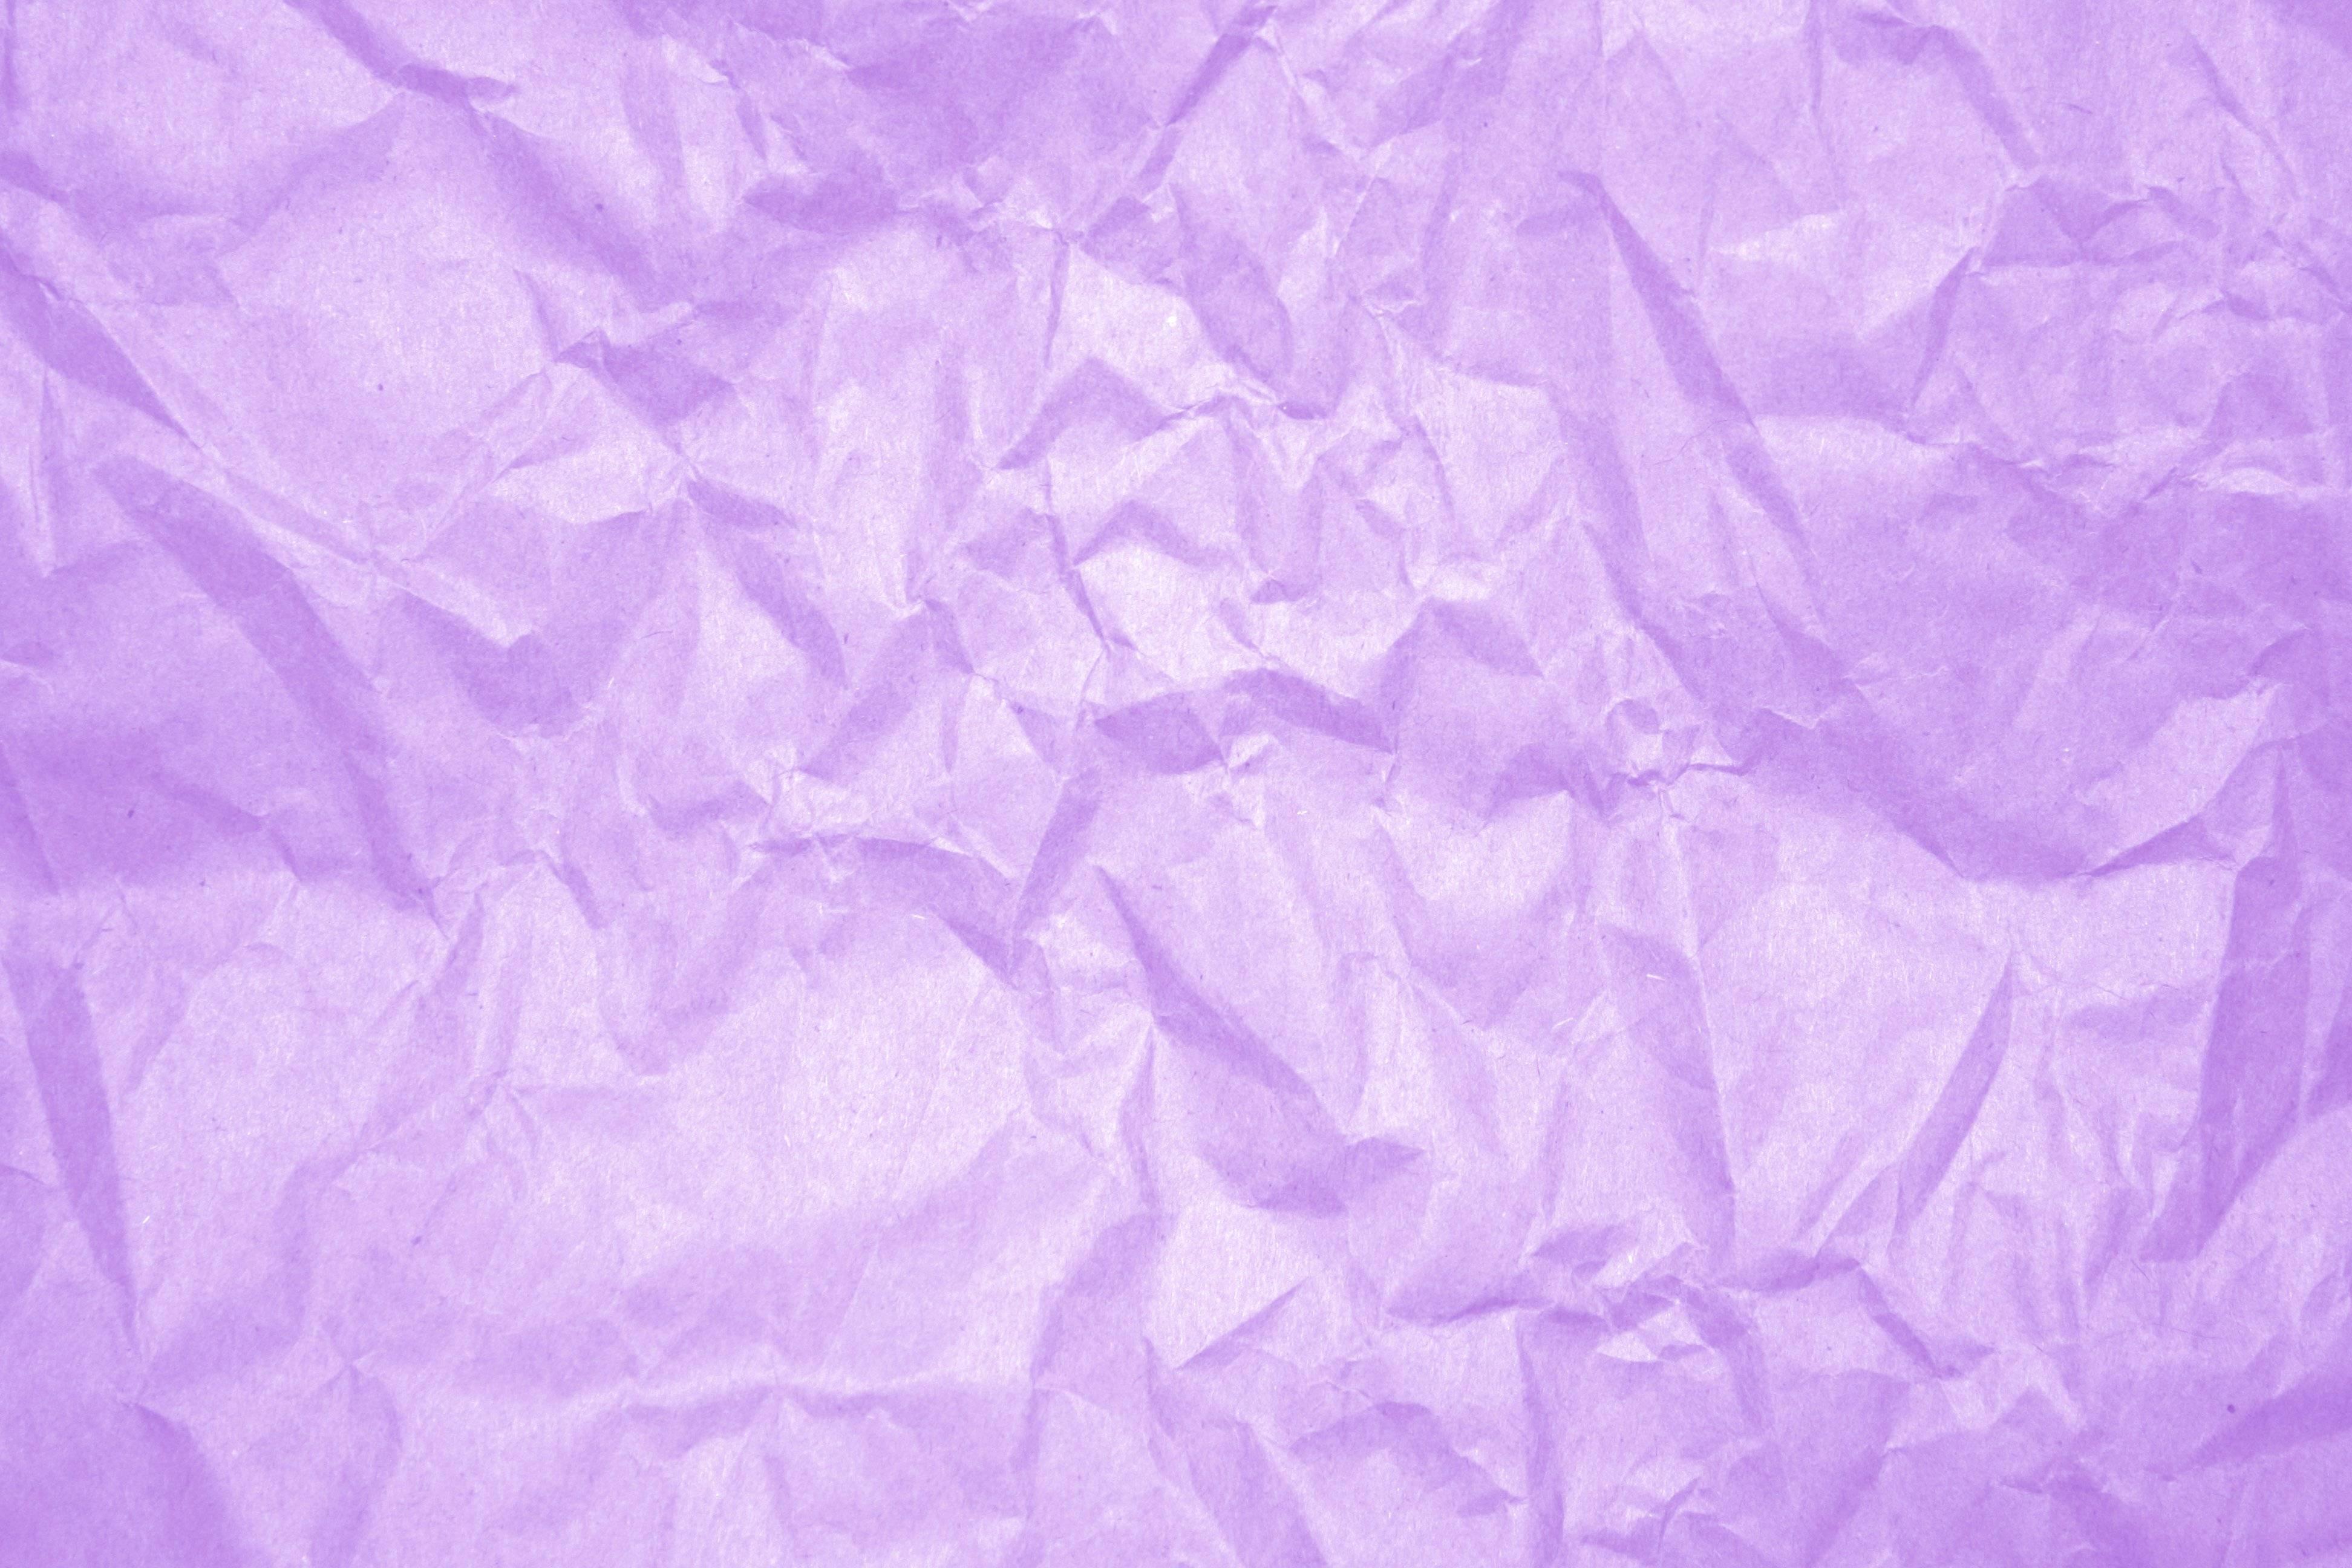 Lavender Backgrounds - Wallpaper Cave - photo#4